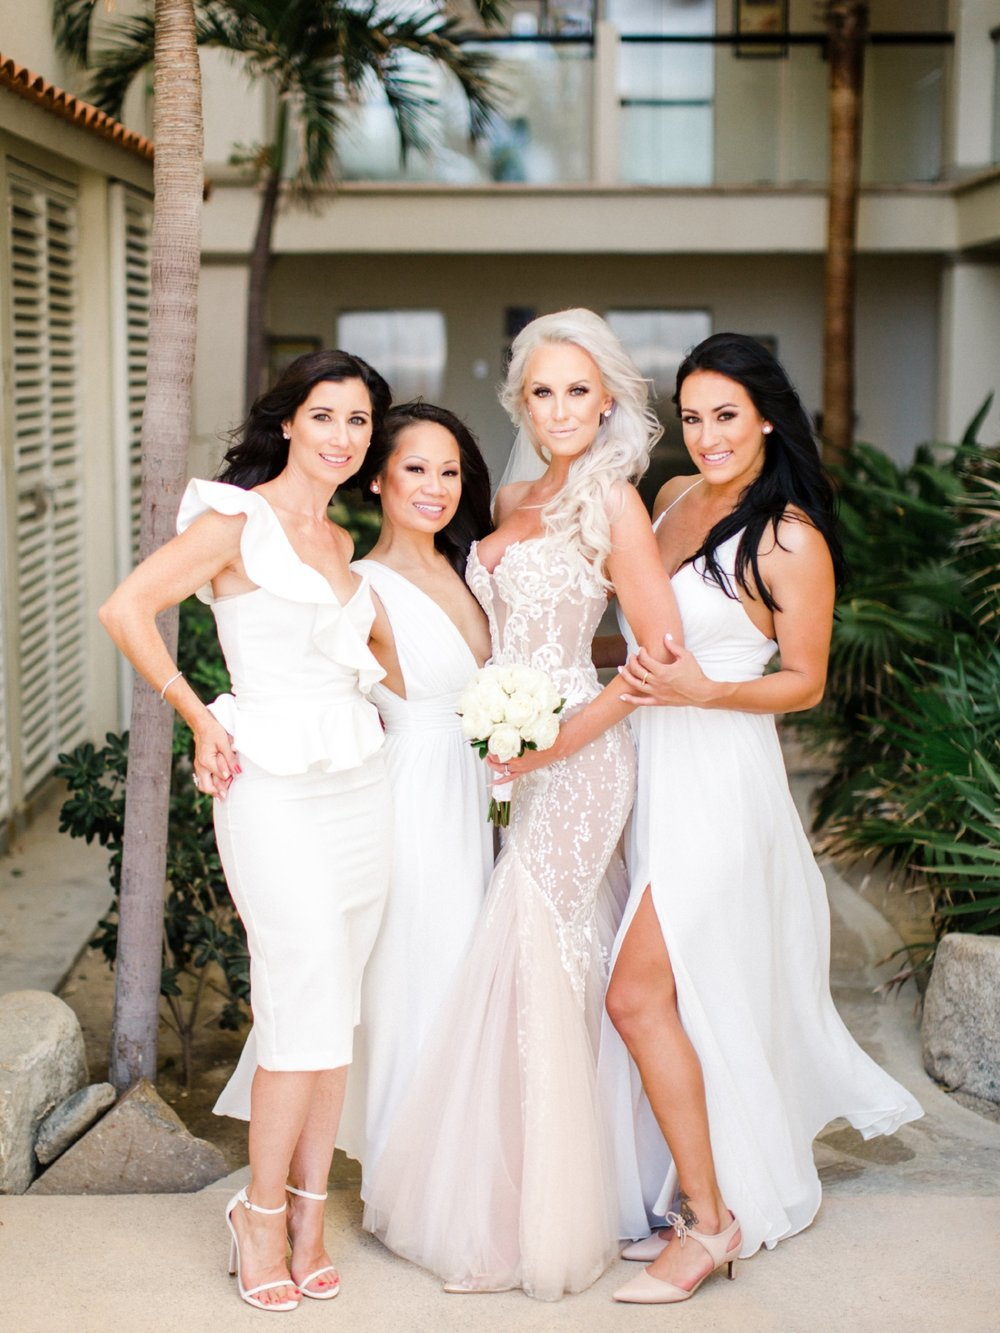 Ziva_Cabo_Mexico_Wedding_Rhianna_Mercier_Photography_Carolyn_Aaron_2018-4562.jpg